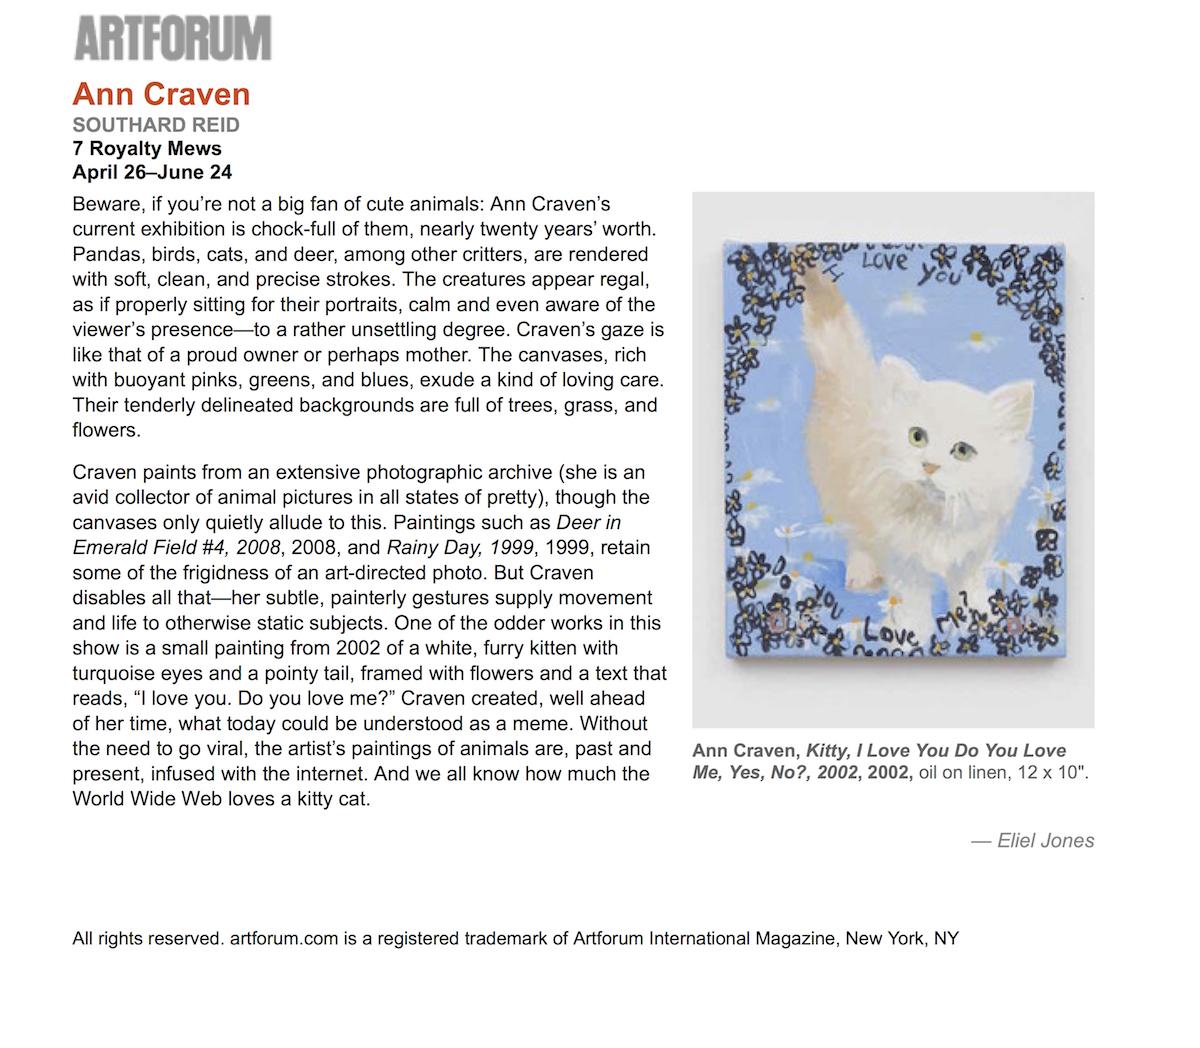 Ann Craven - artforum.com : critics' picks